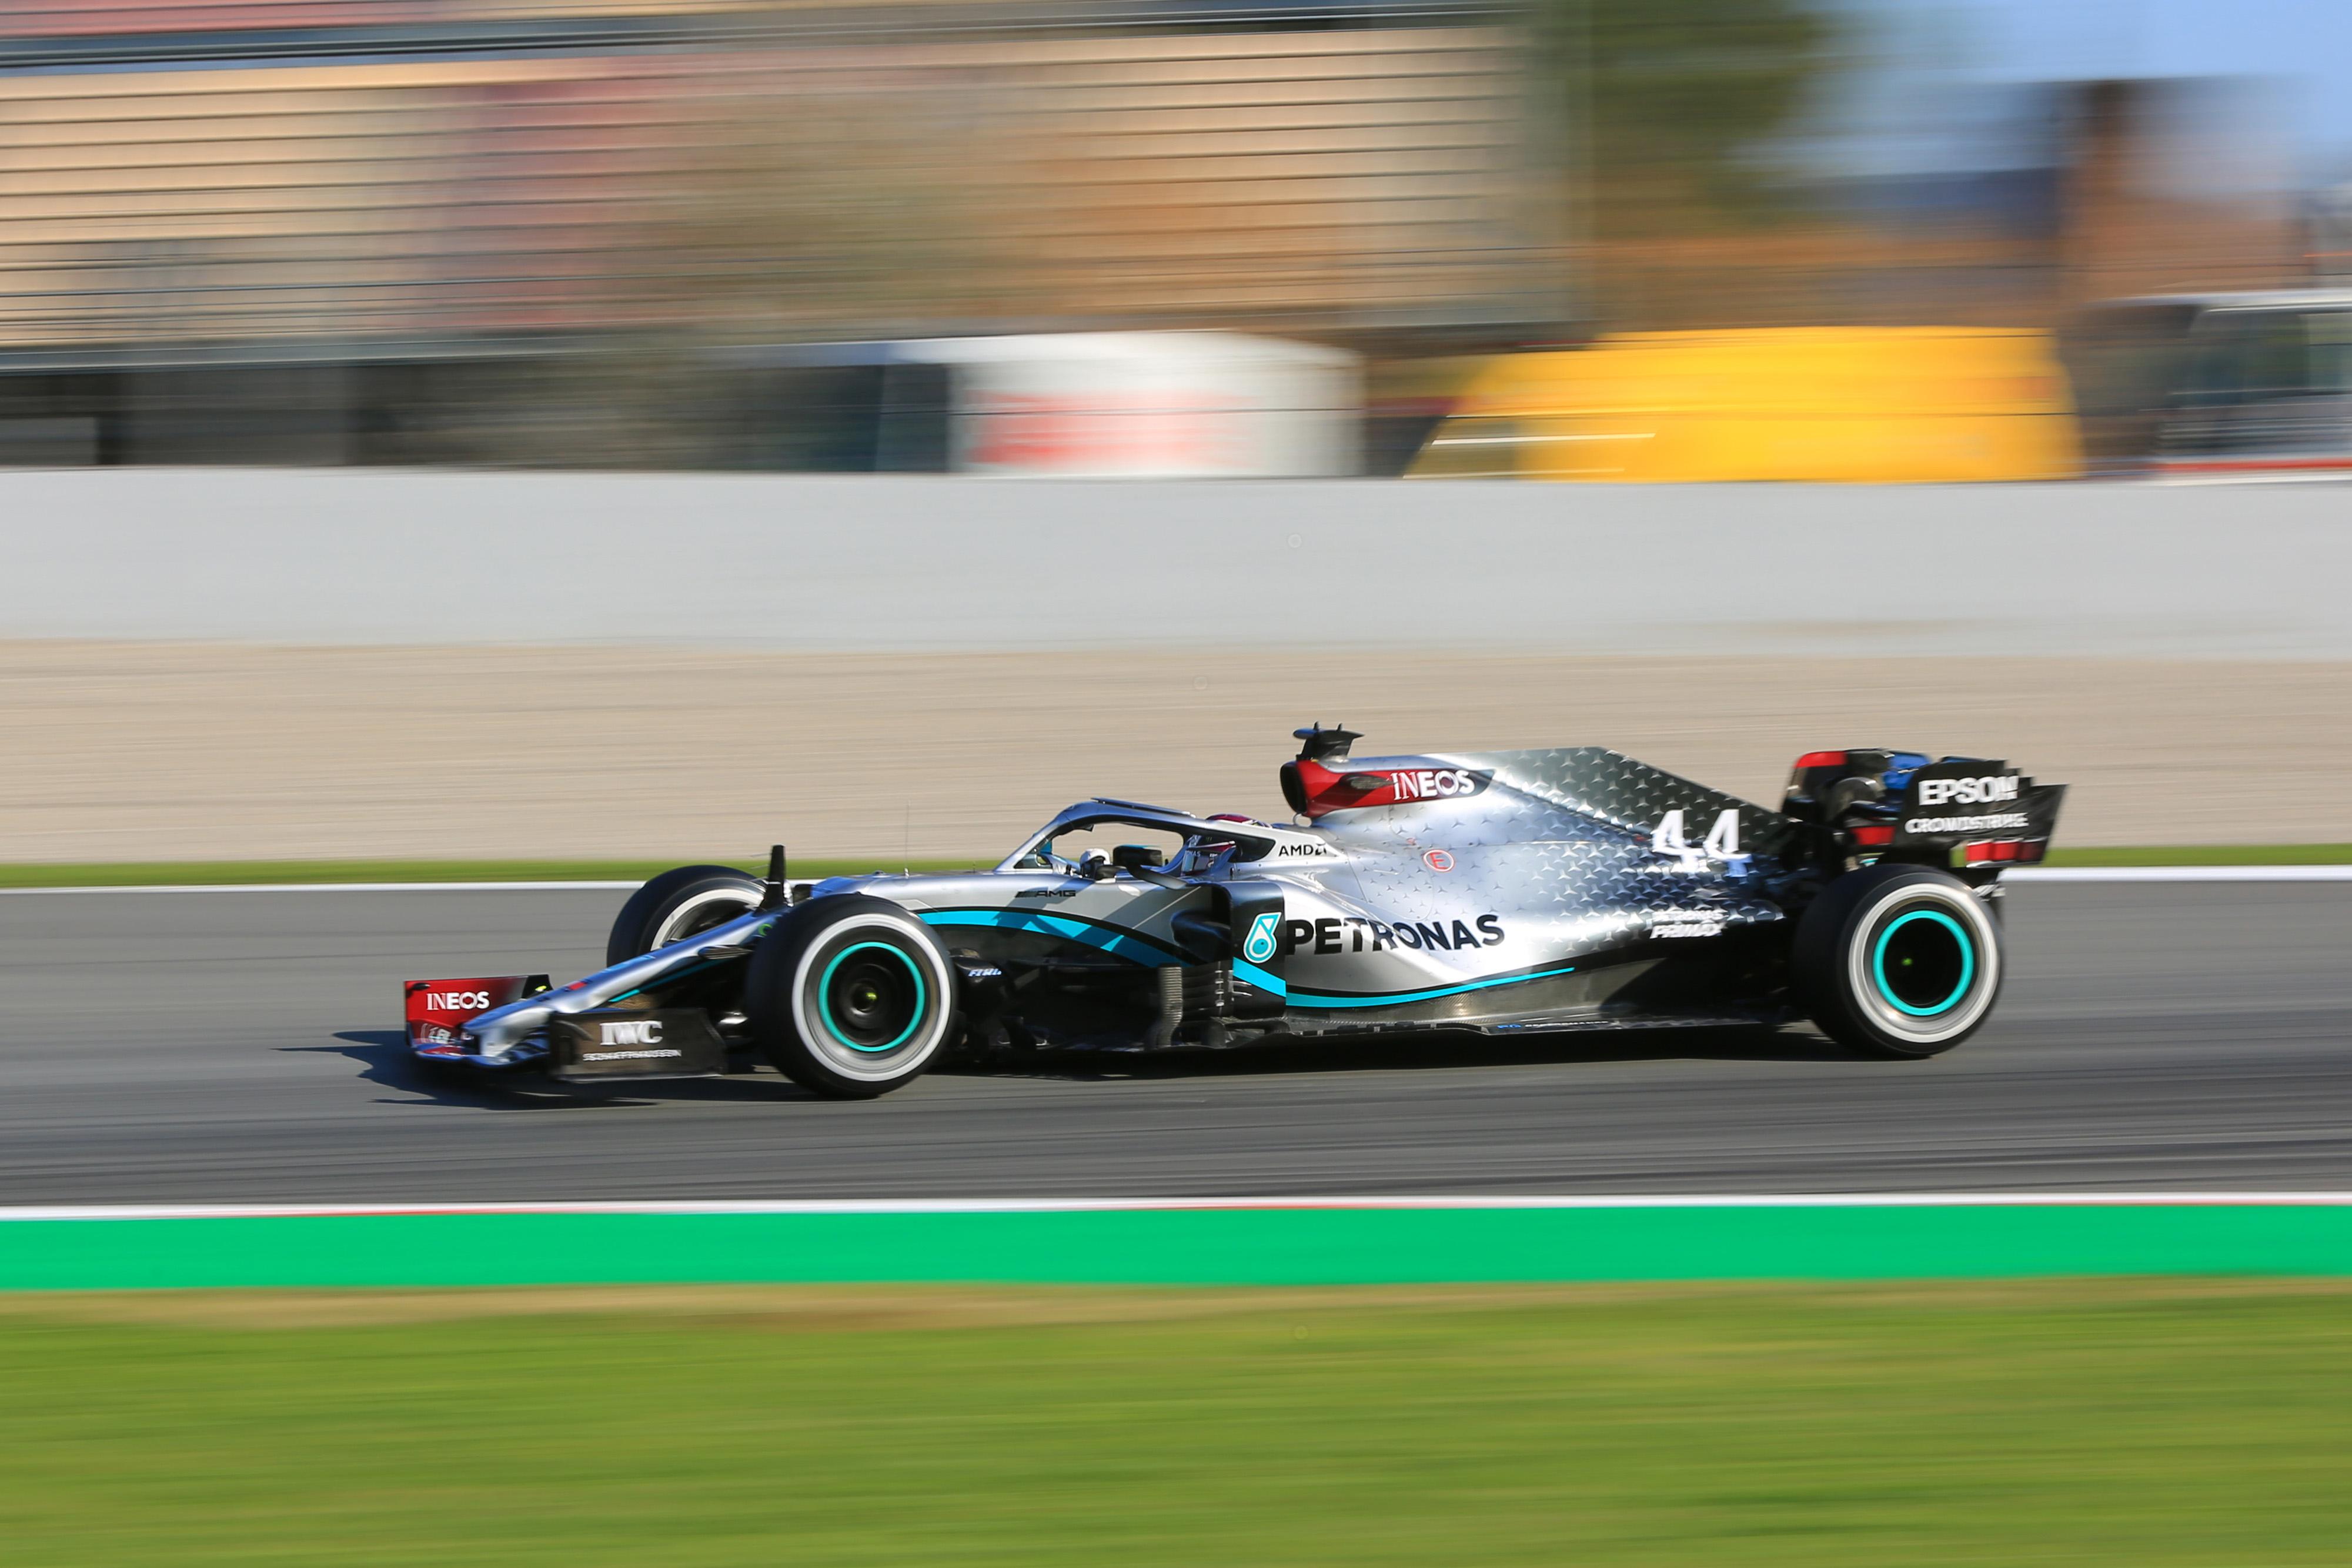 F1 Formula 1 Testing Lewis Hamilton Mercedes afternoon